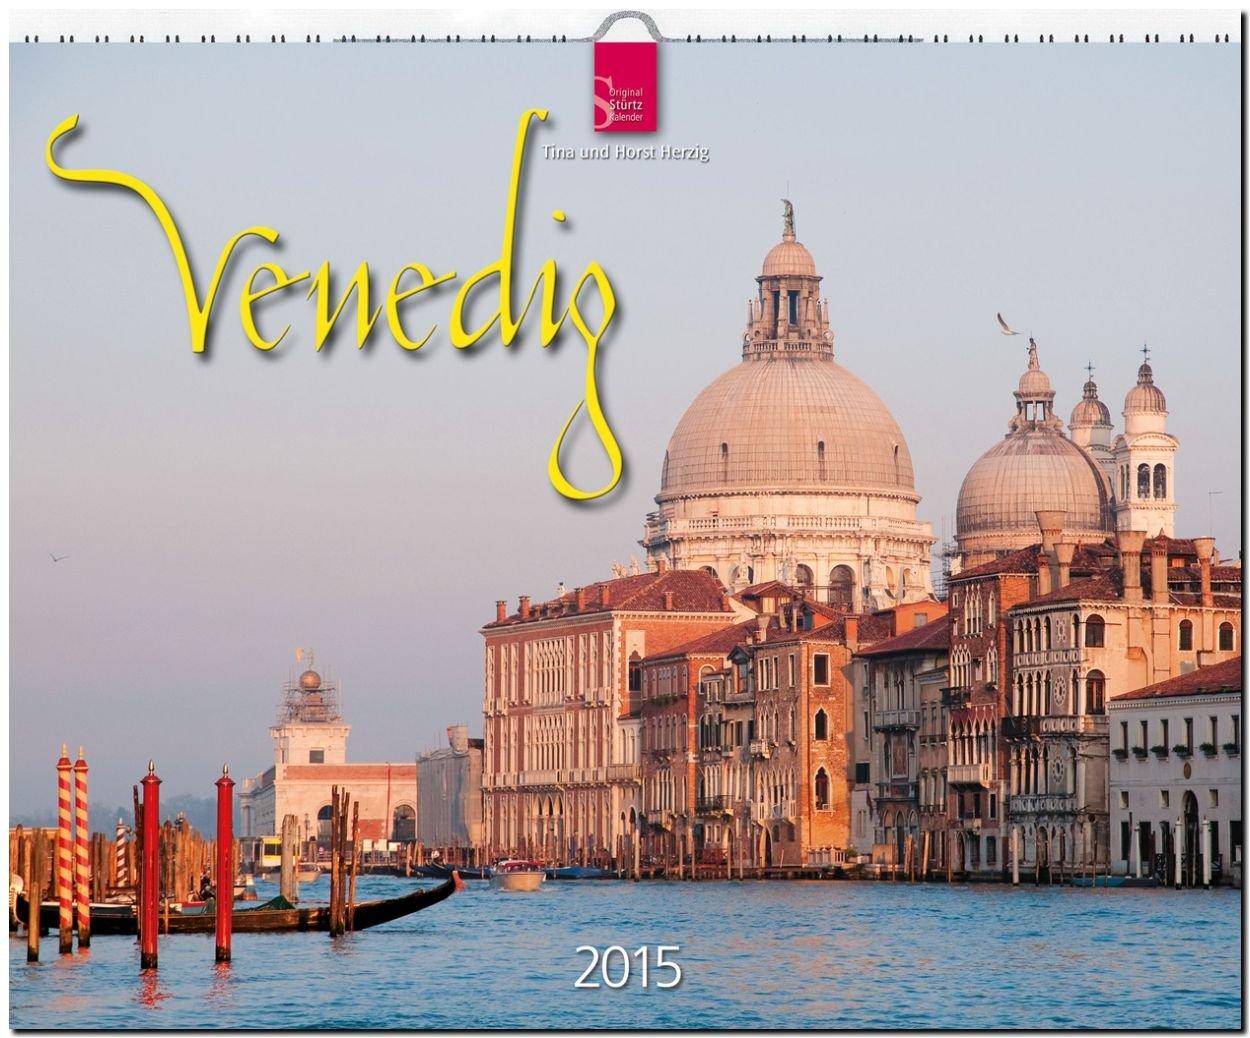 Venedig 2015 - Original Stürtz-Kalender - Großformat-Kalender 60 x 48 cm